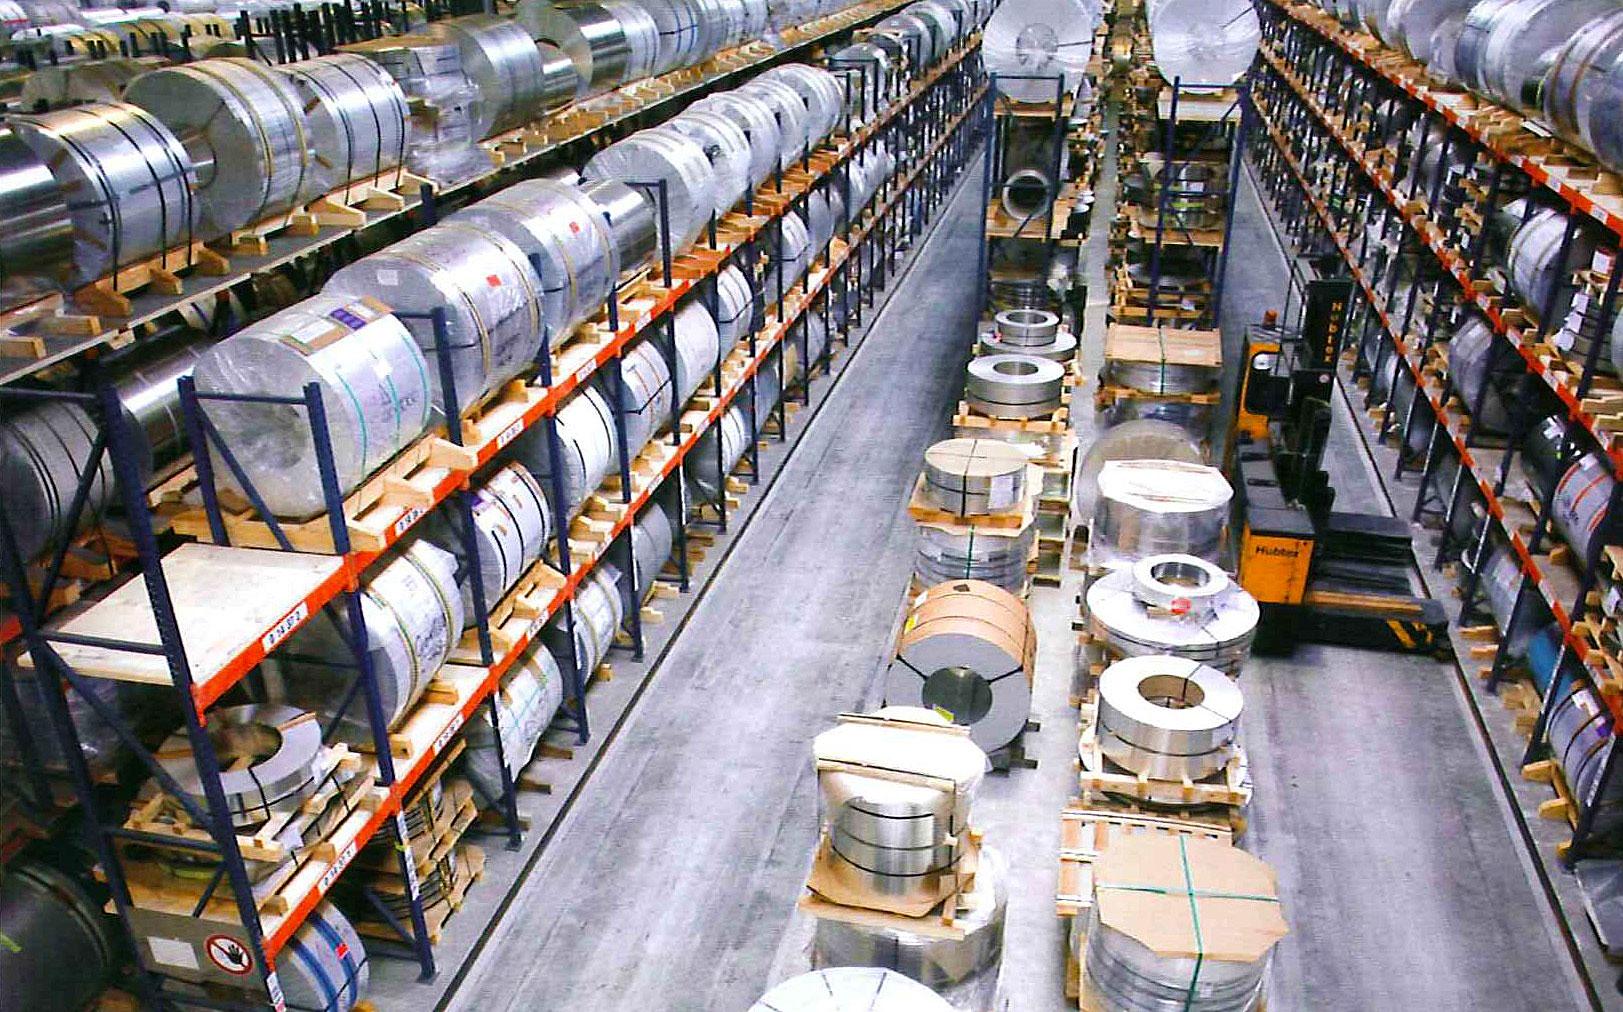 Hubtex Electric Multidirectional Sideloader in narrow aisle coil pallet racks